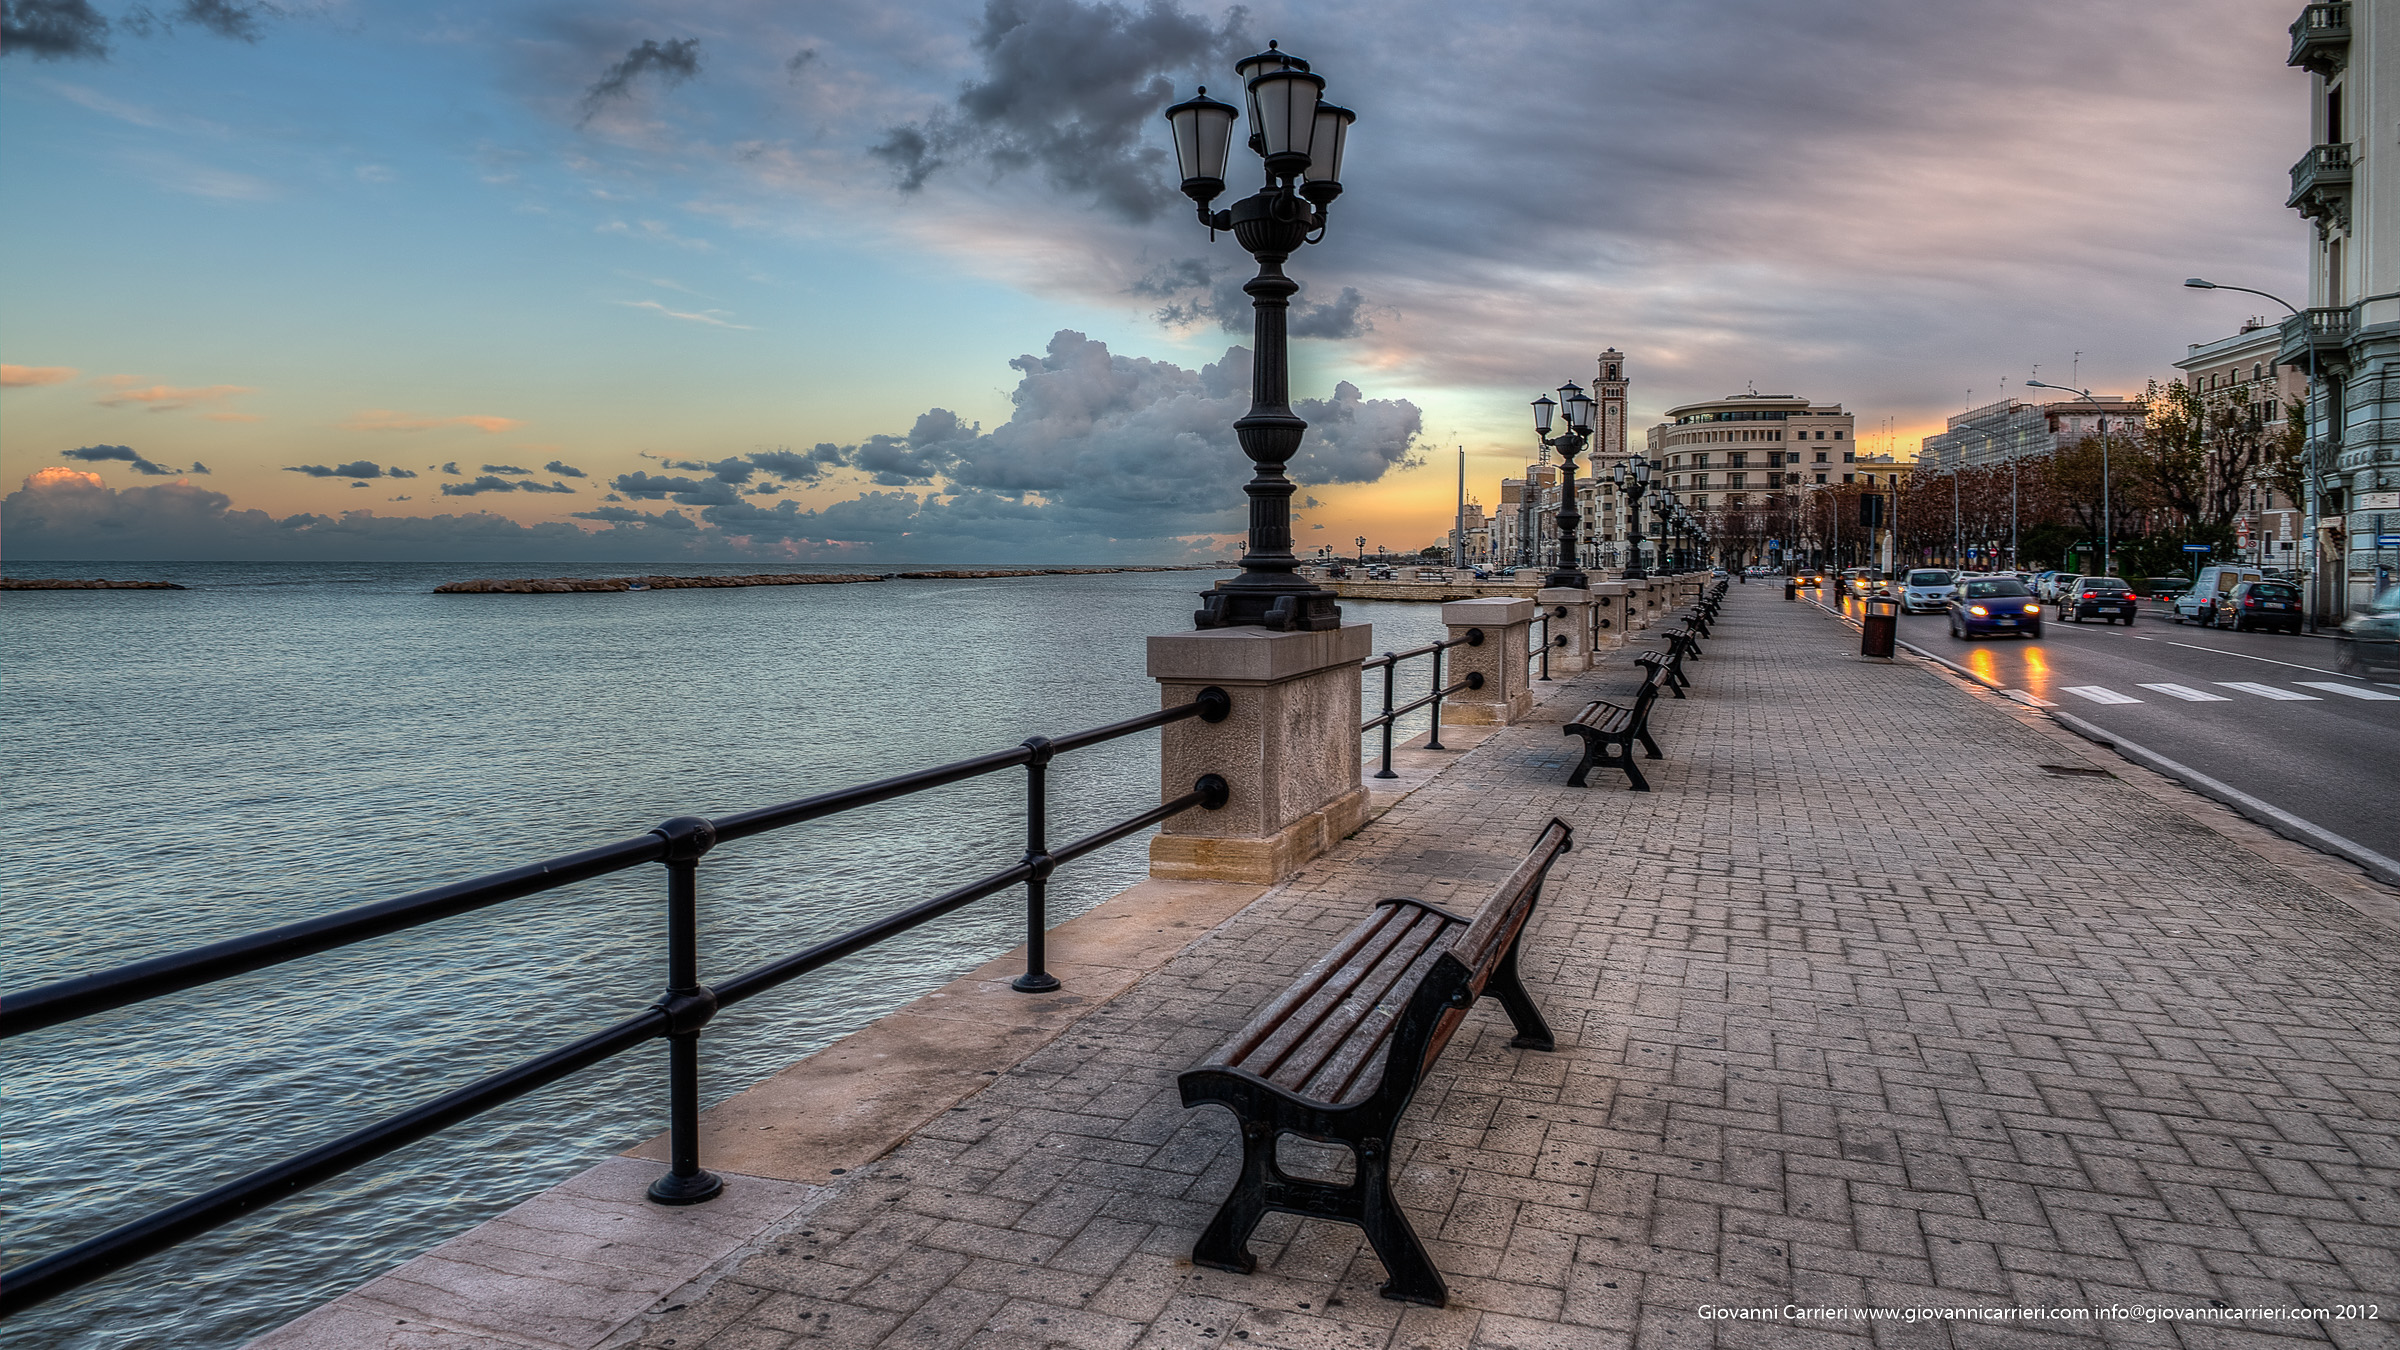 Promenade of Bari - Apulia